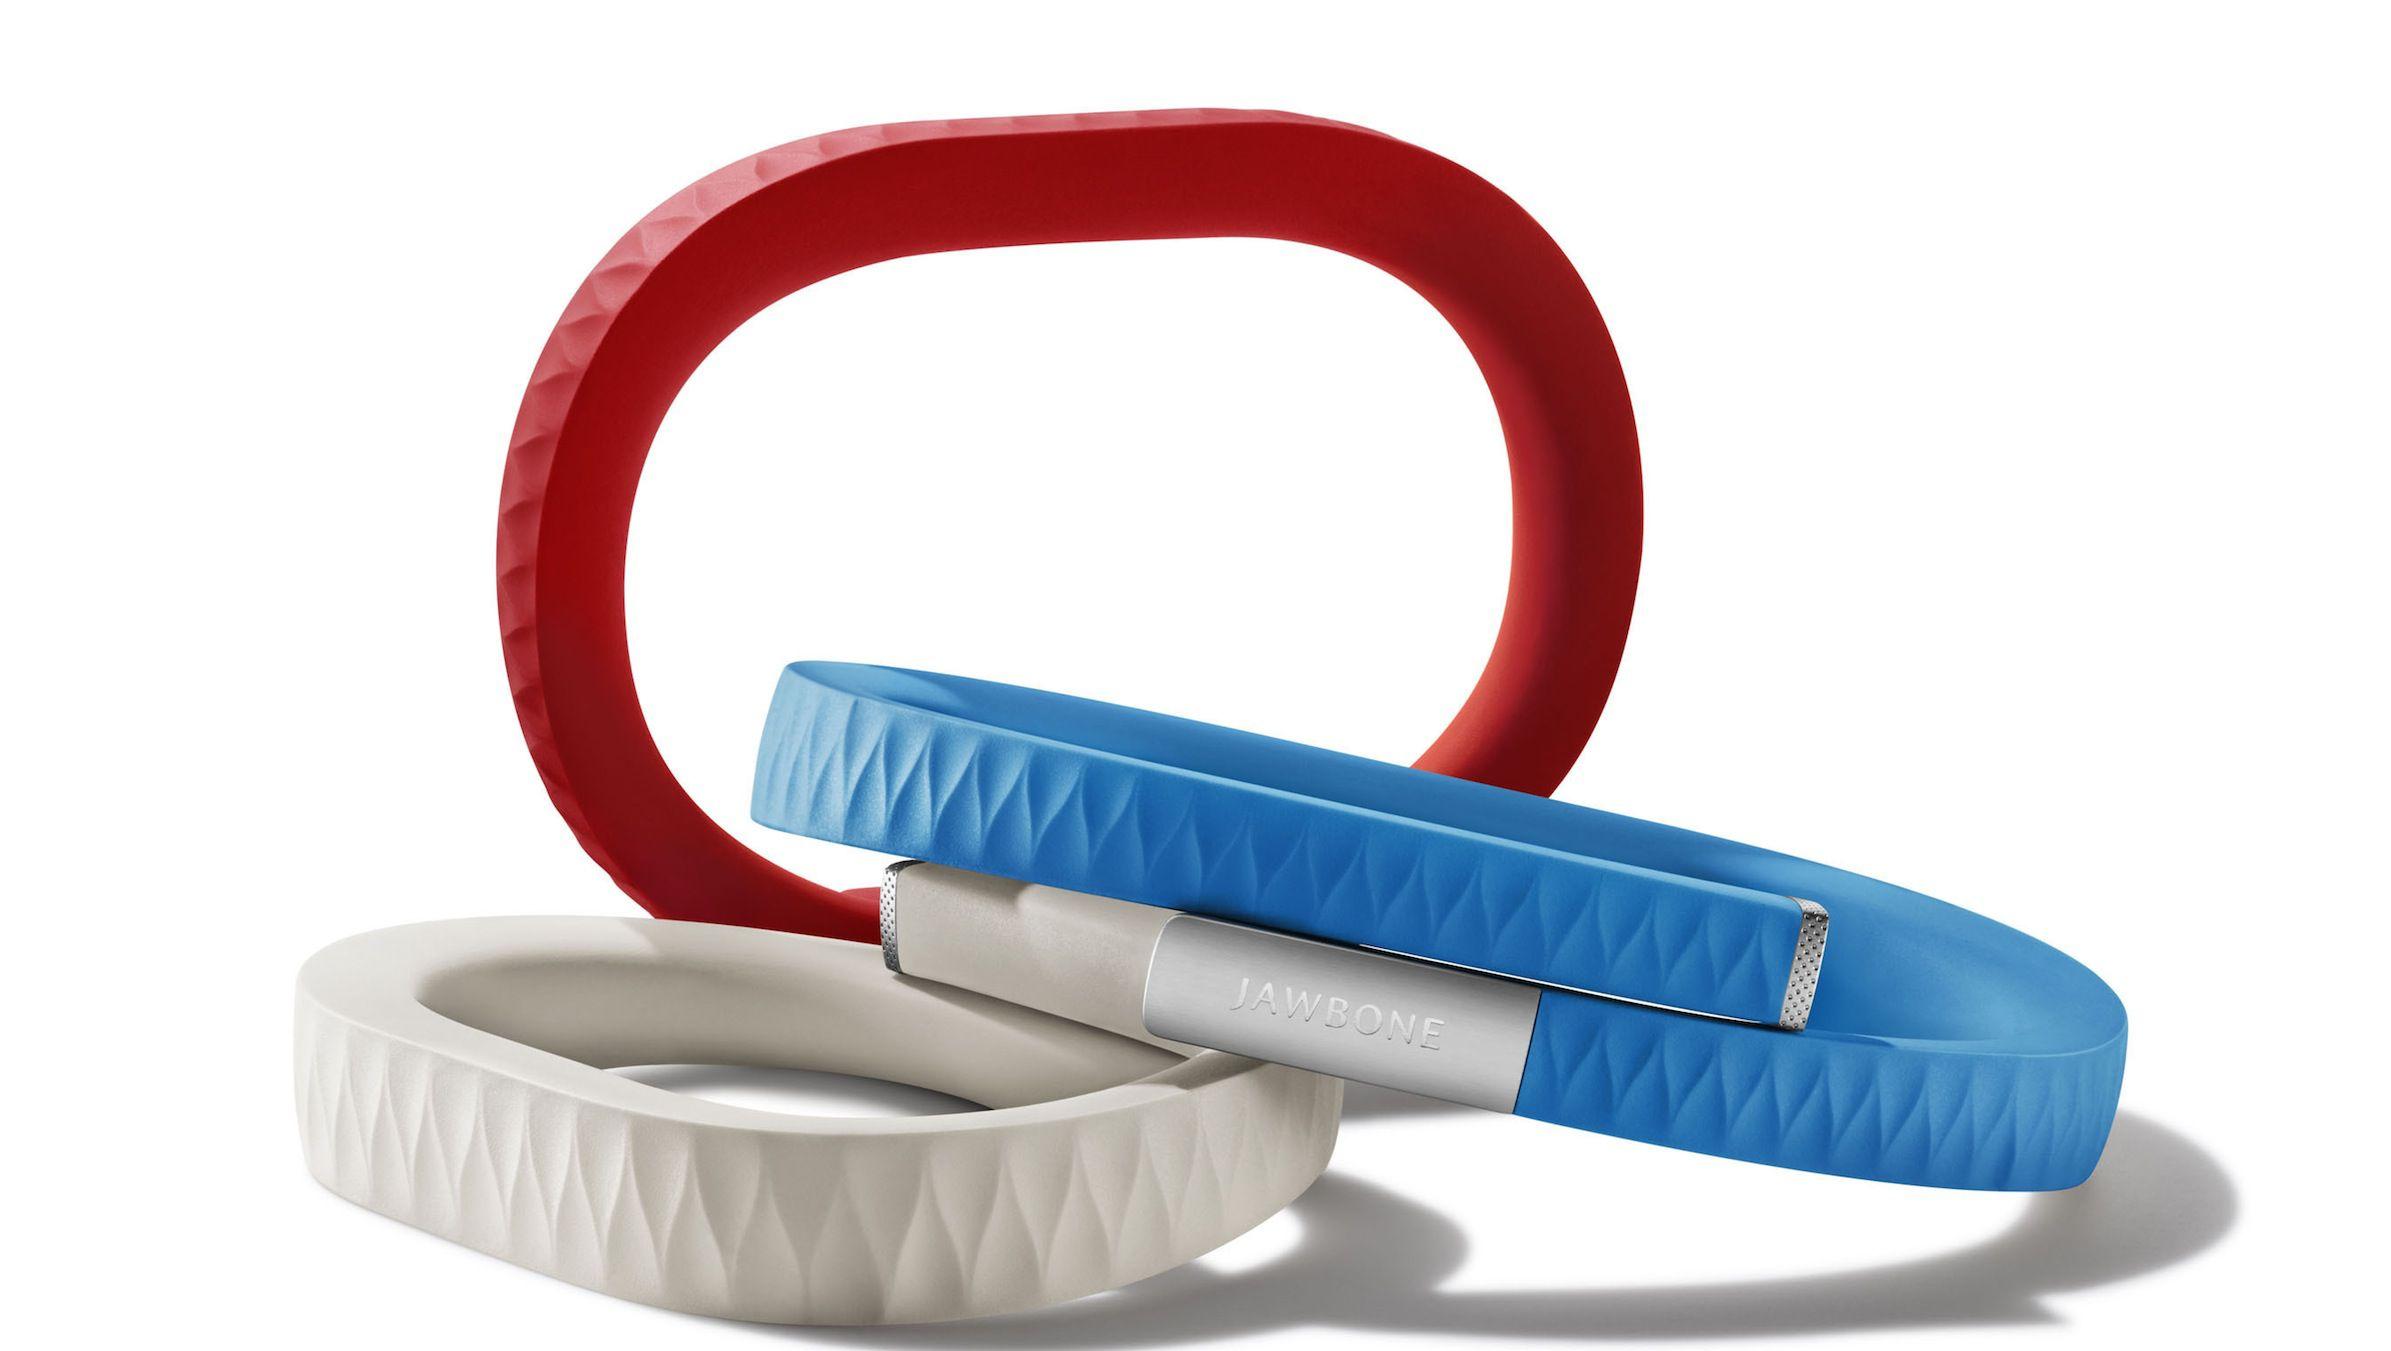 Jawbone UP bracelets